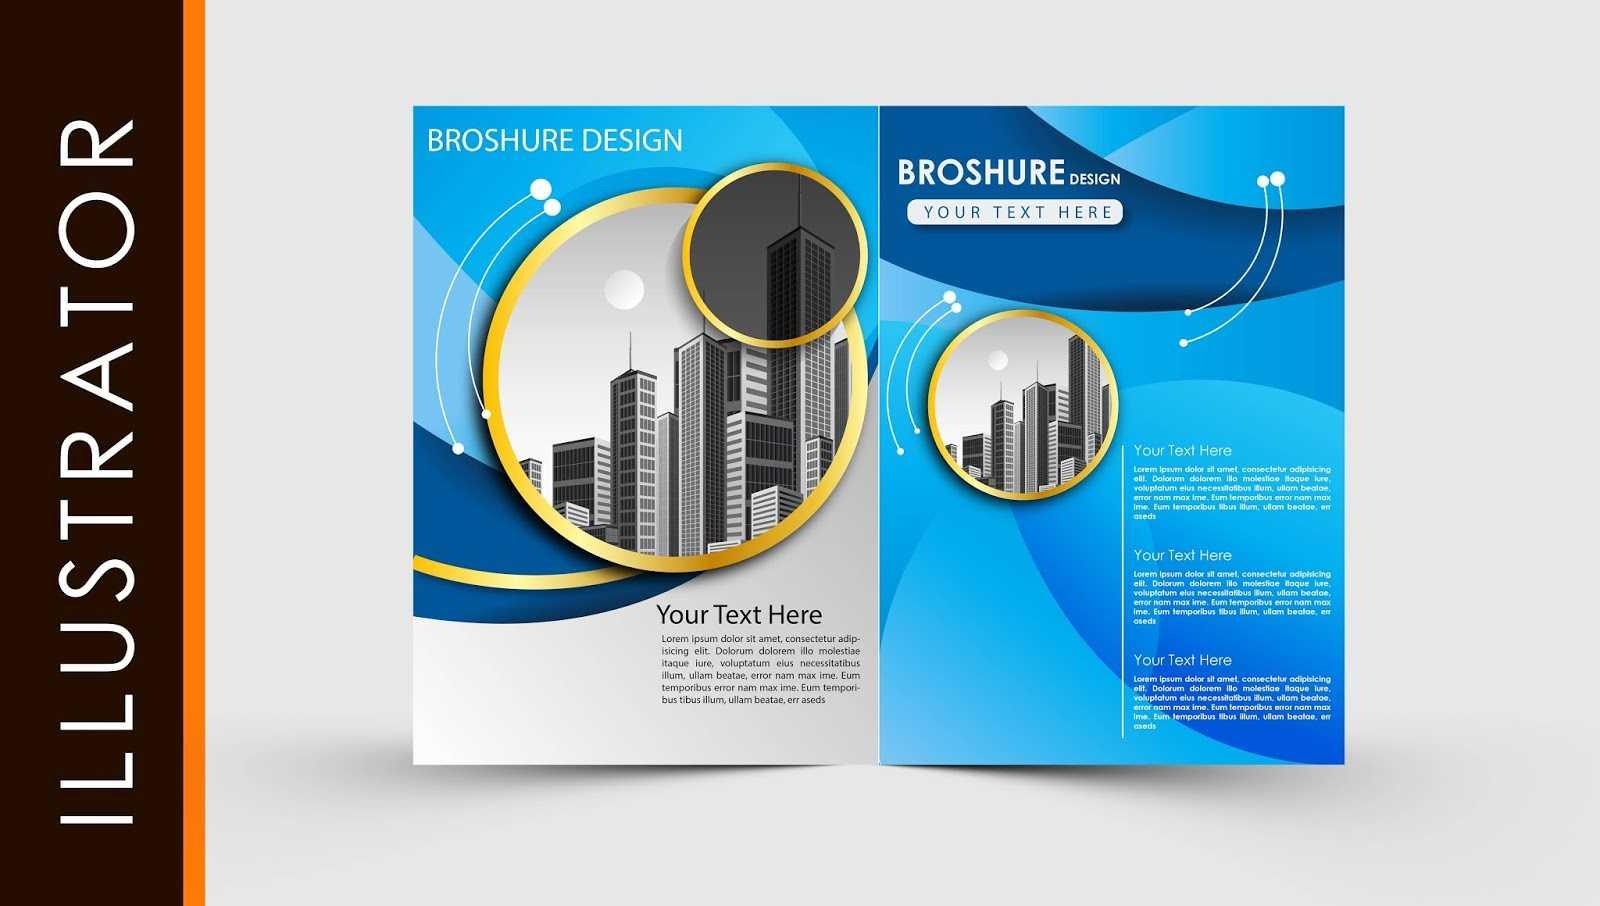 Free Download Adobe Illustrator Template Brochure Two Fold Regarding Illustrator Brochure Templates Free Download